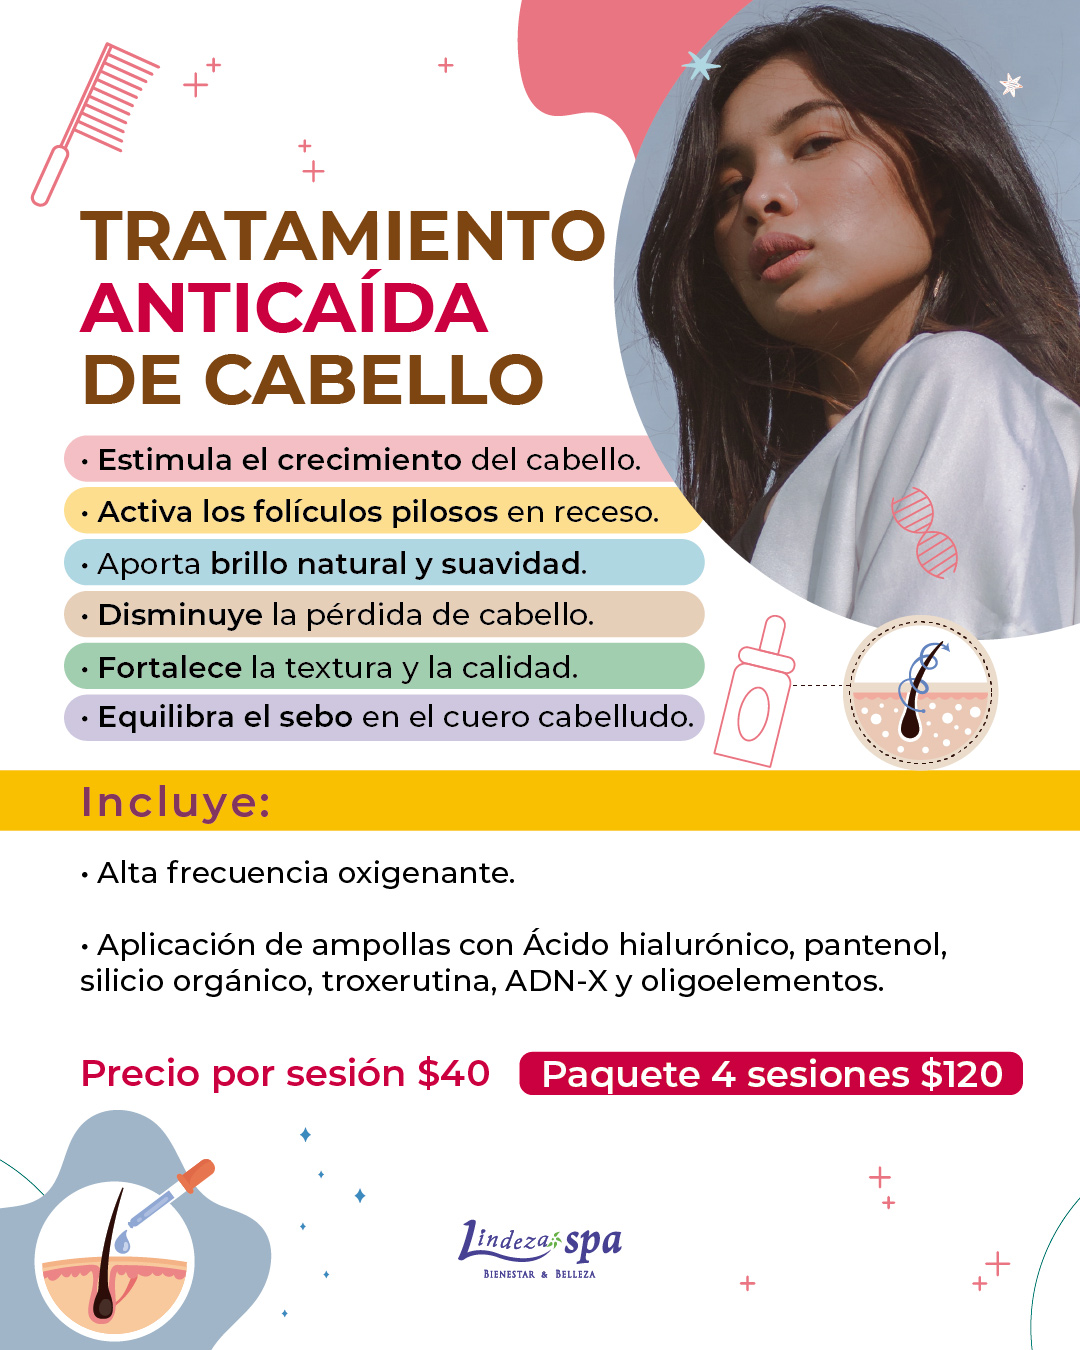 Anticaída de cabello, cabello fuerte en Guayaquil, remedios para la caída de cabello